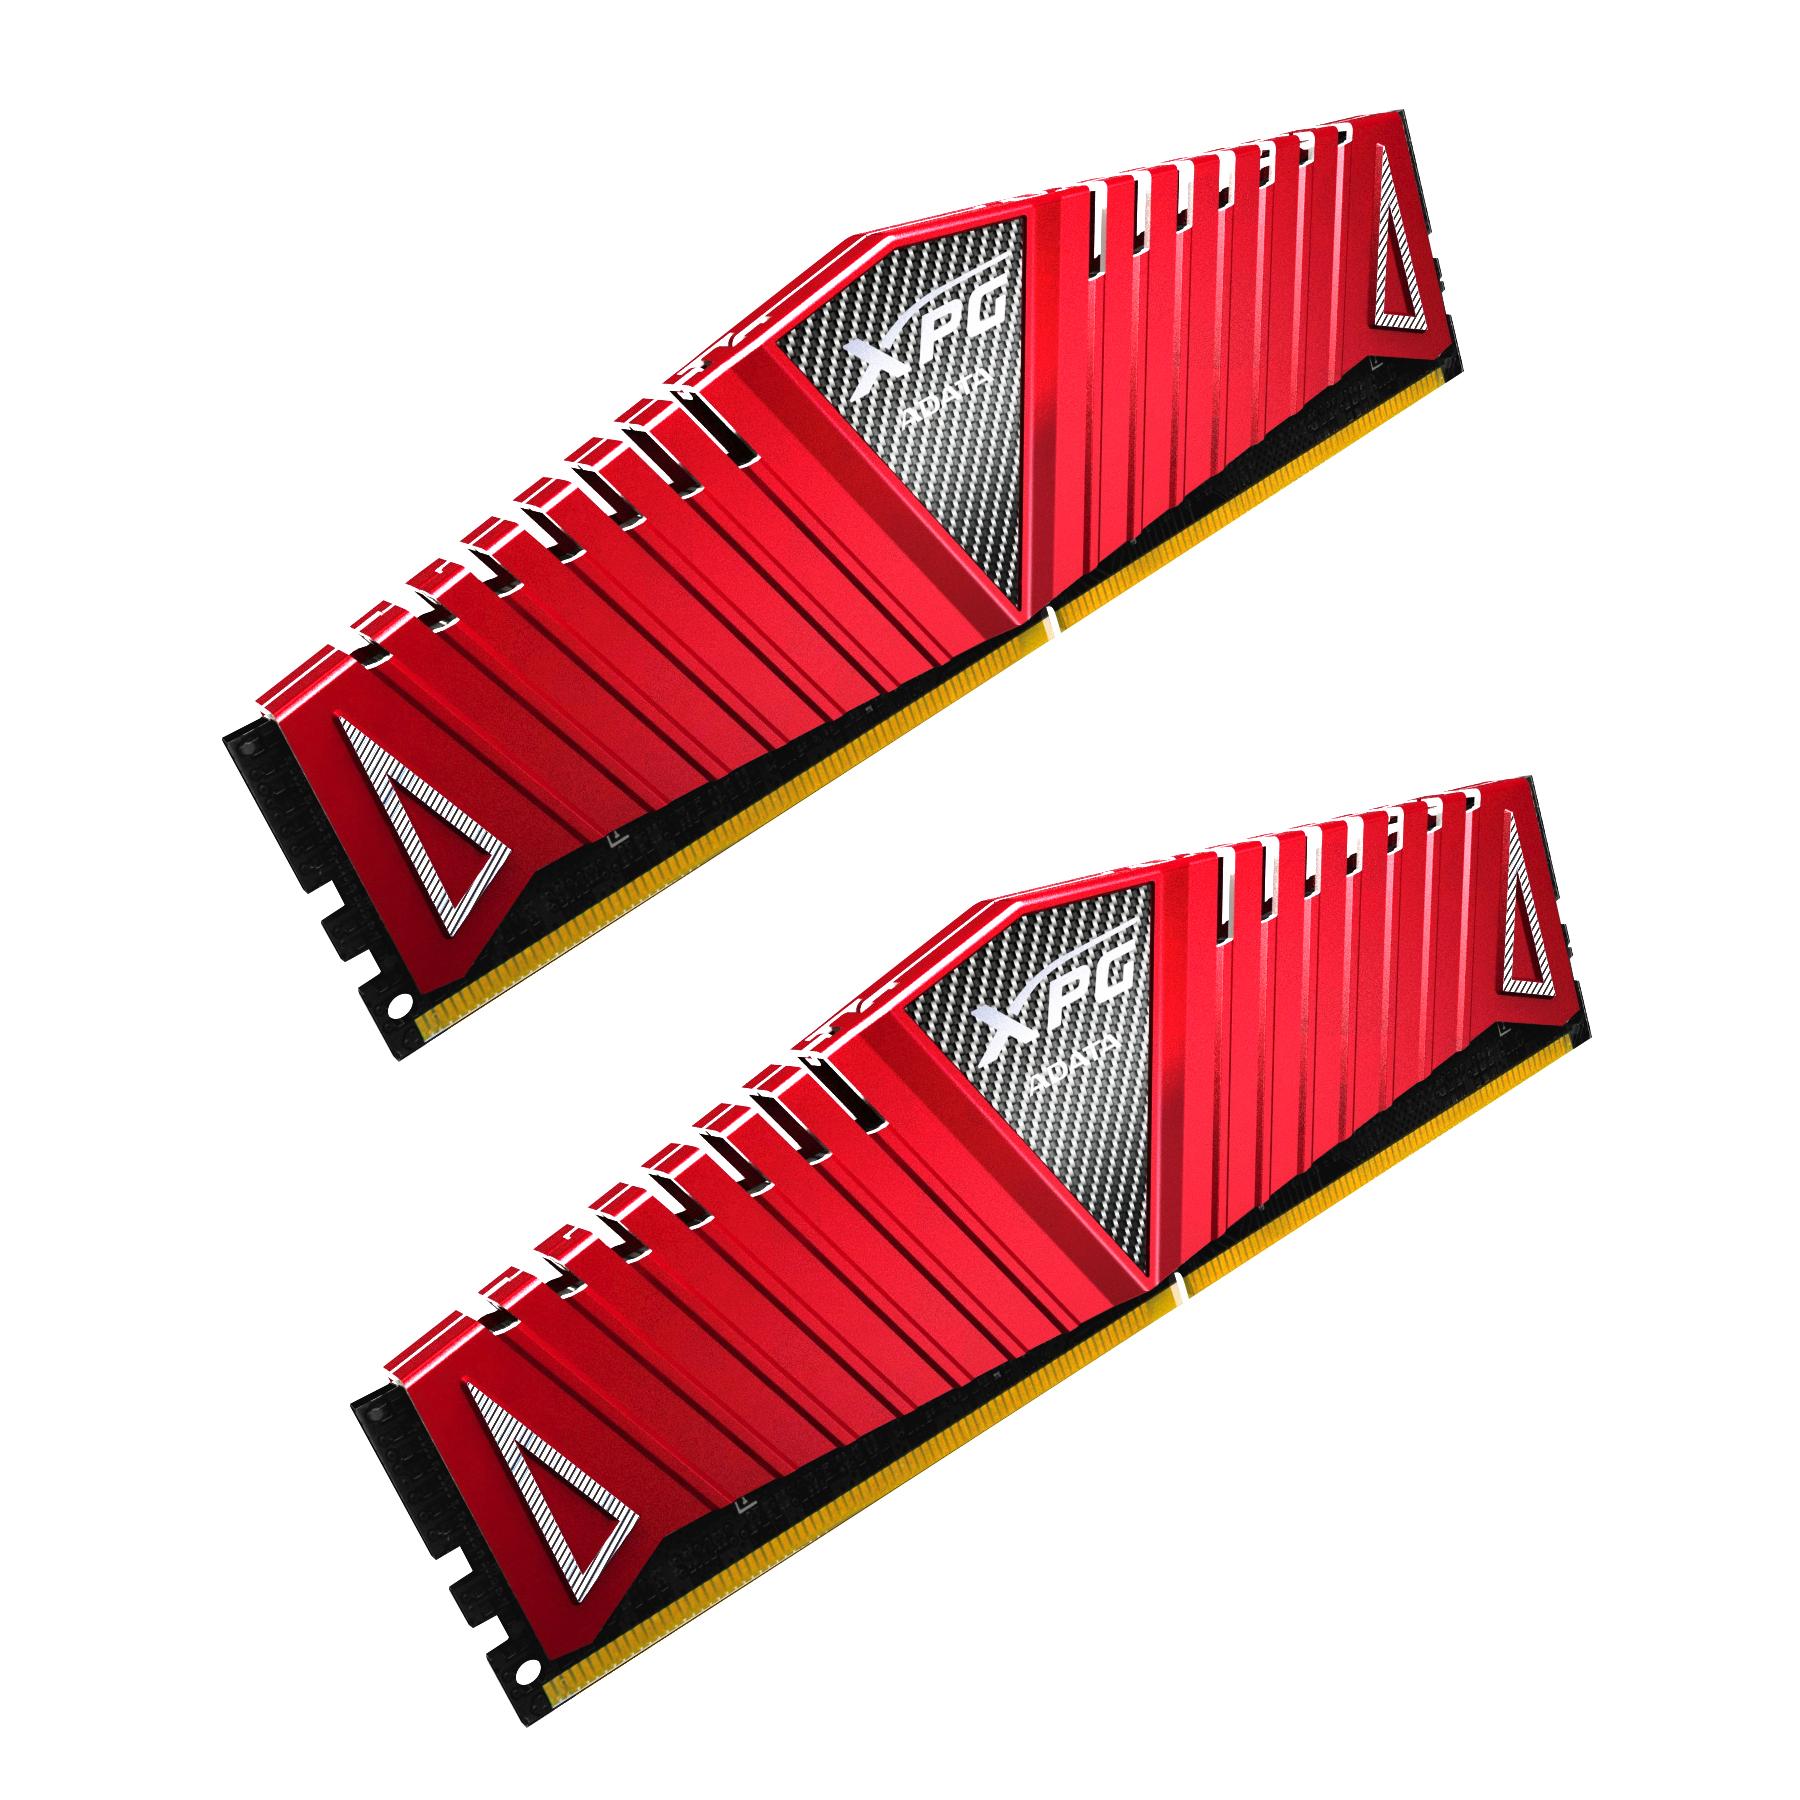 ADATA Technology Co., Ltd.-XPG Z1 Gaming DDR4